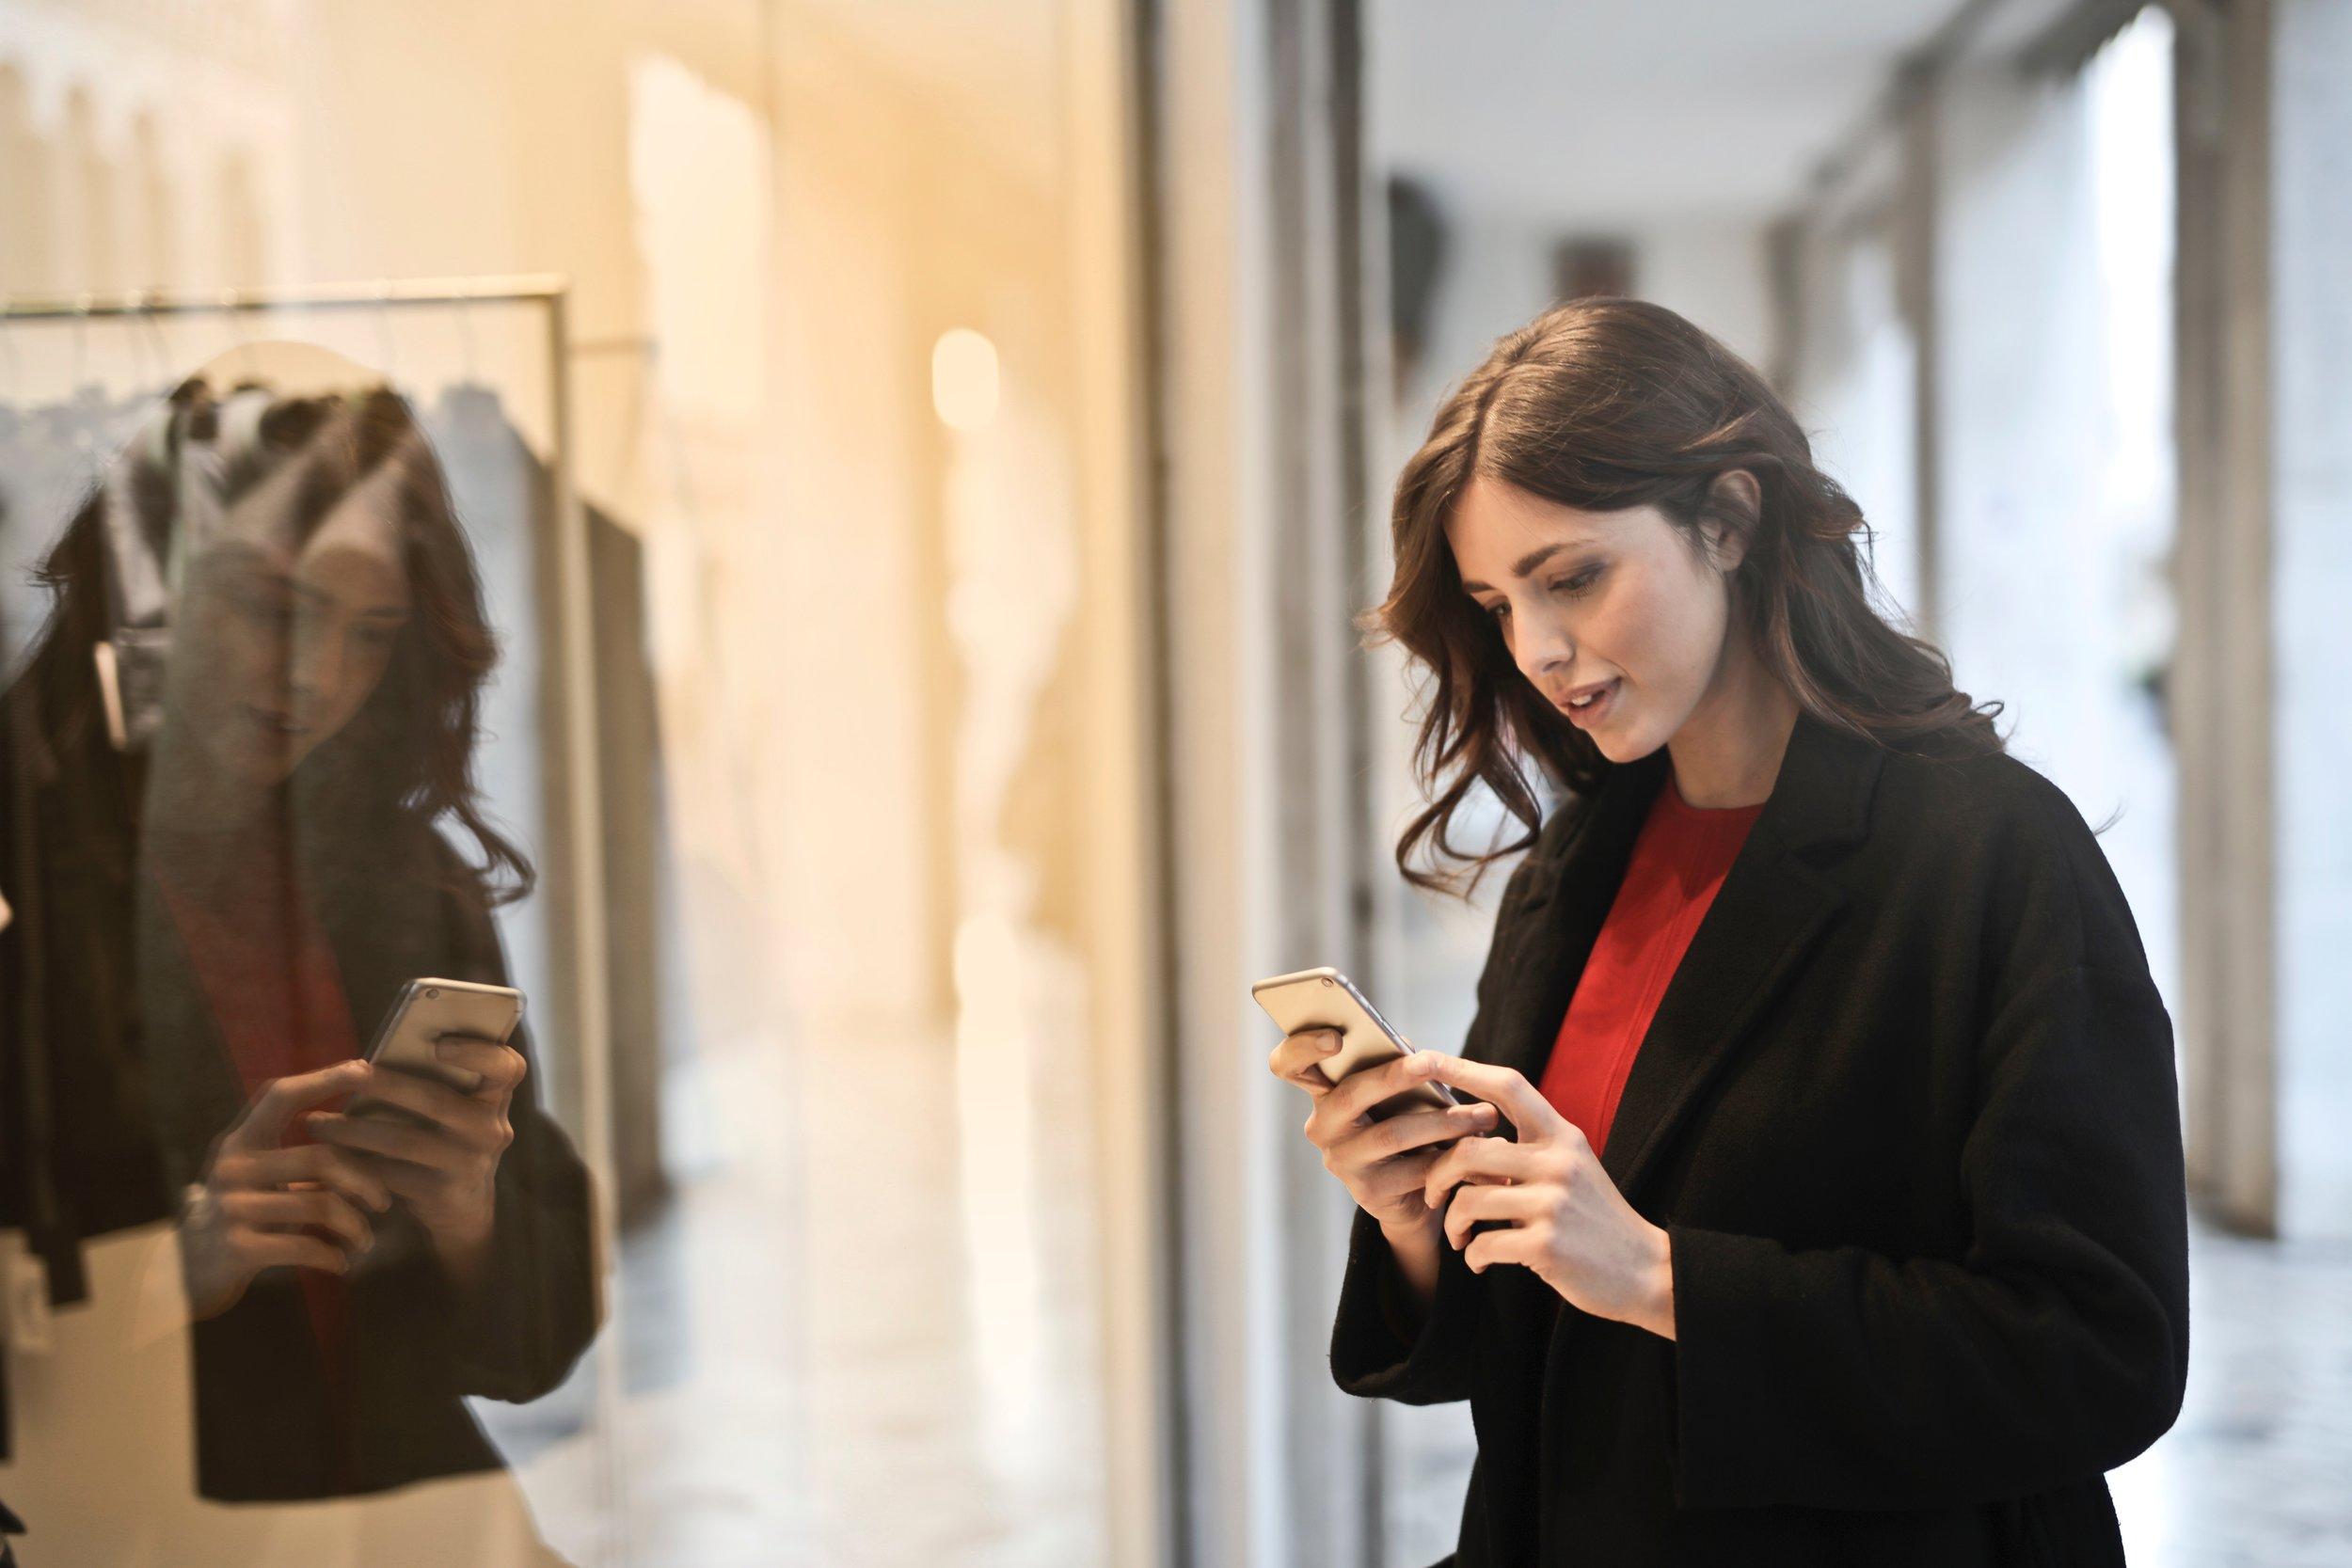 woman-shopping-on-phone.jpg